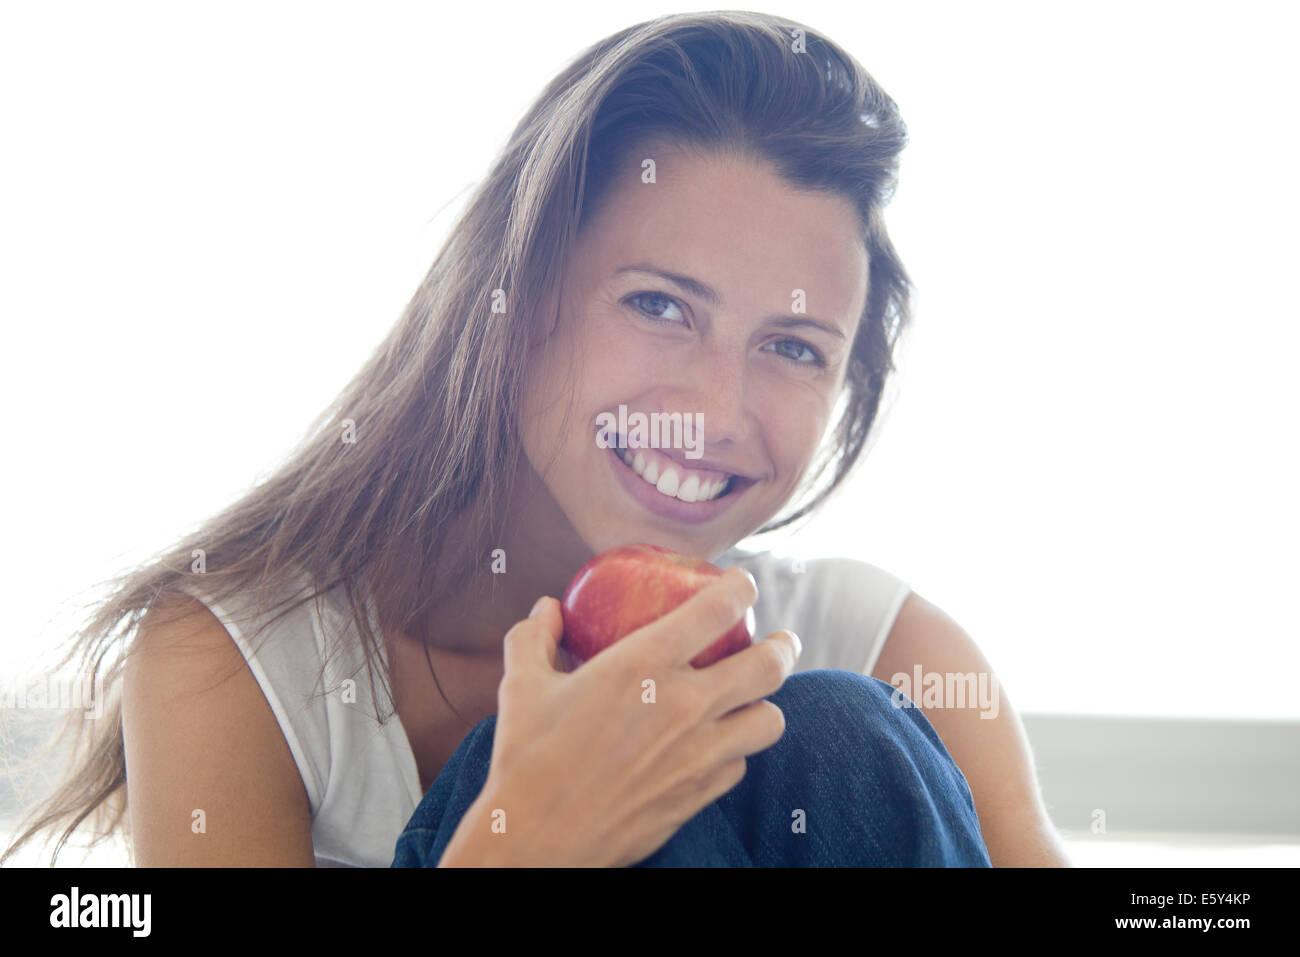 Frau mit Apfel, Lächeln, Porträt Stockbild